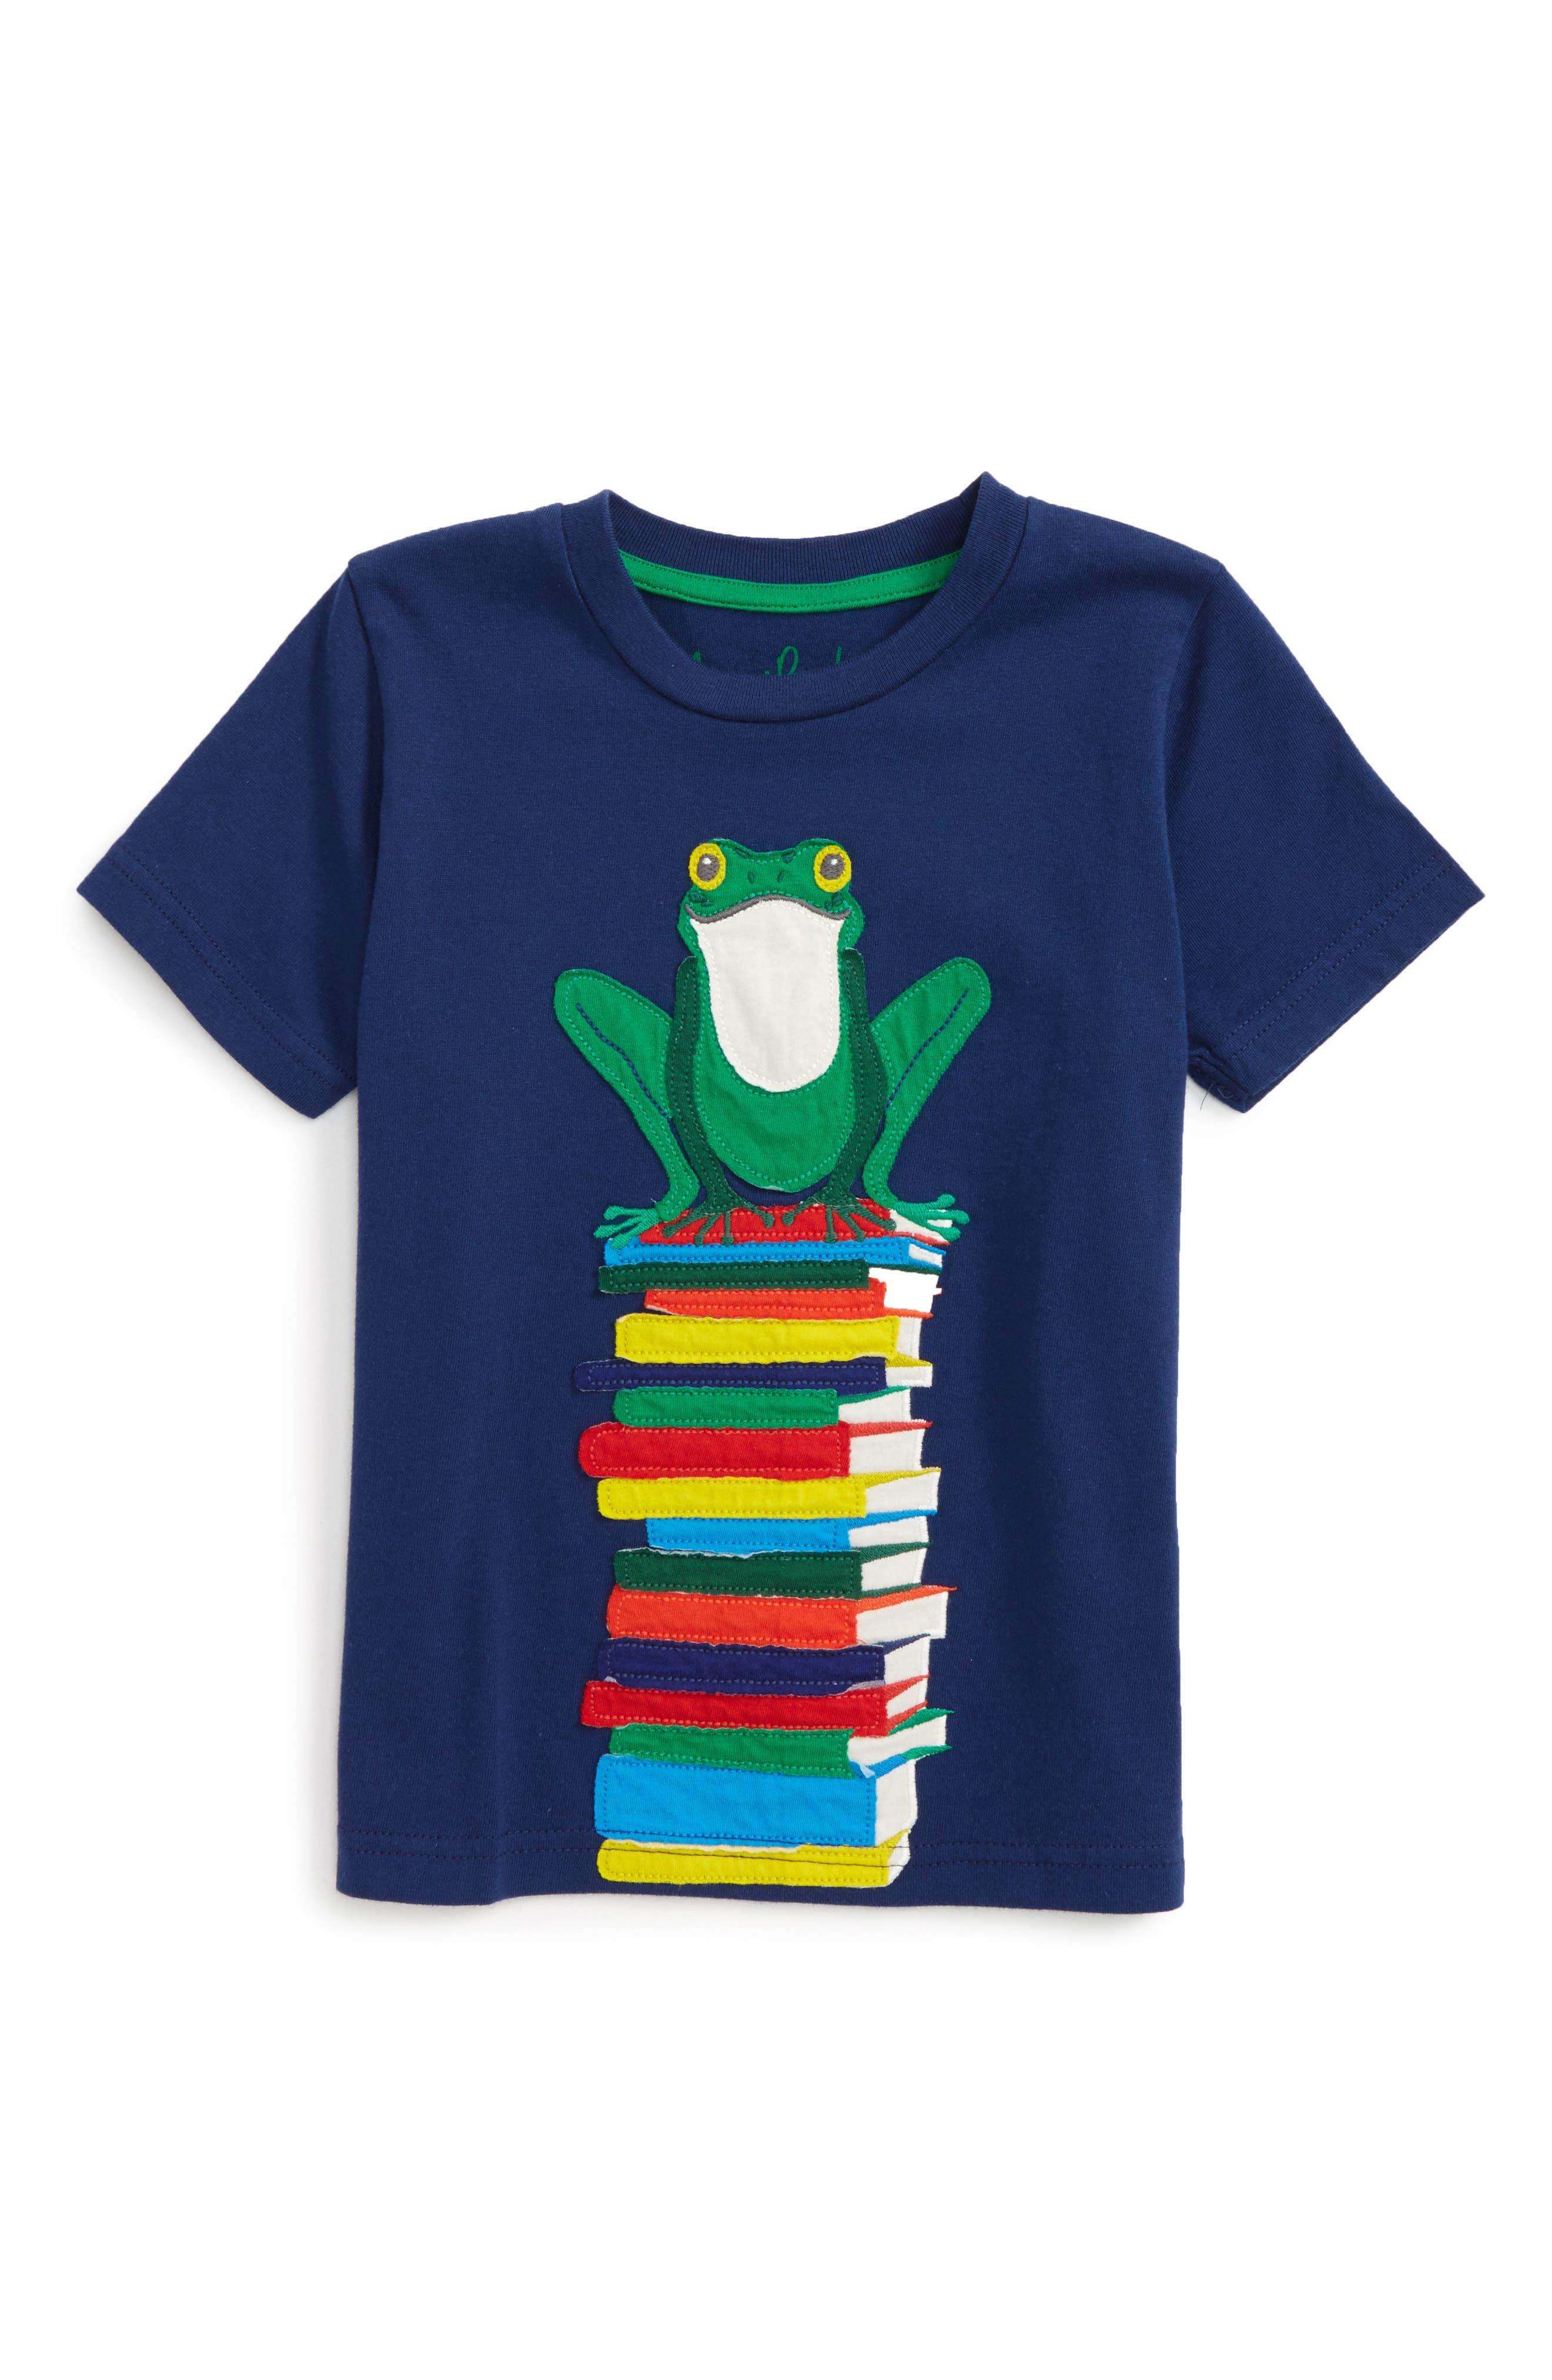 Alternate Image 1 Selected - Mini Boden Big Appliqué T-Shirt (Toddler Boys, Little Boys & Big Boys)